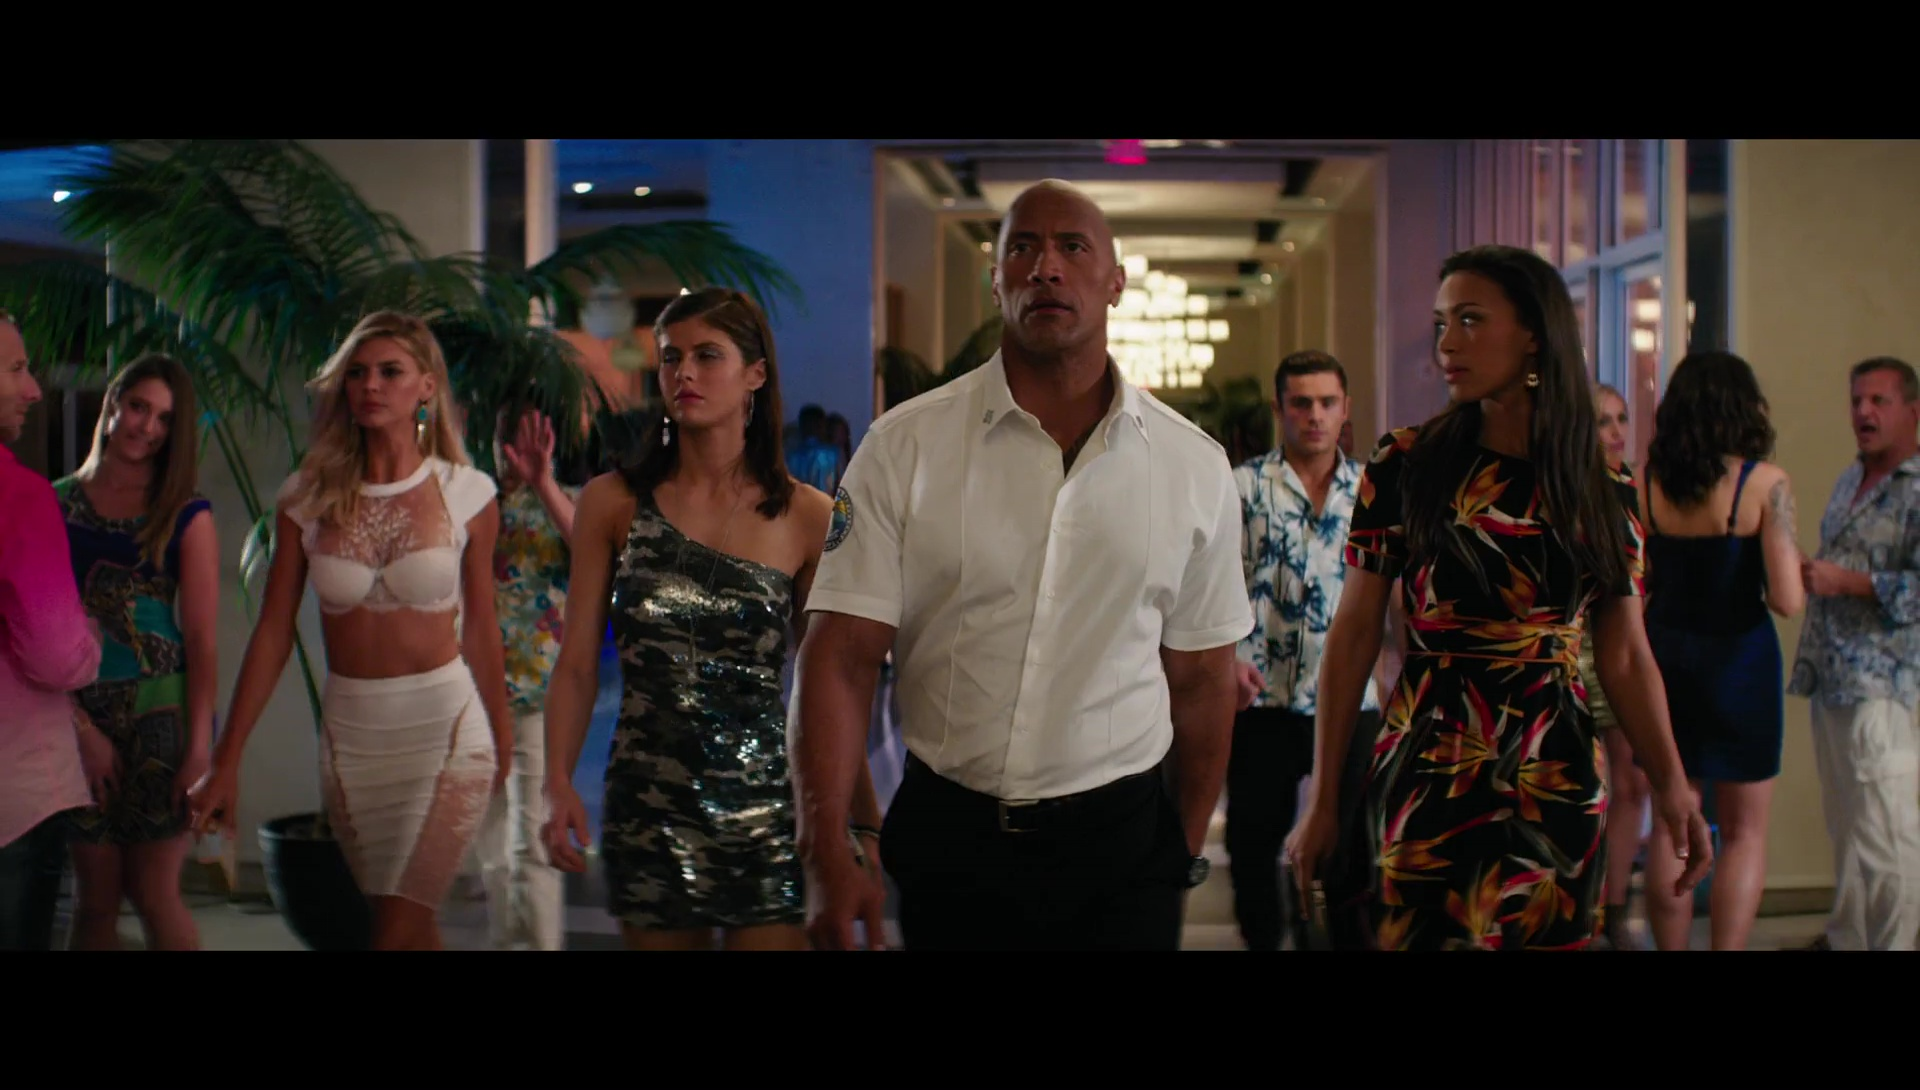 Baywatch Guardianes De La Bahia 1080p Lat-Cast-Ing 5.1 (2017)